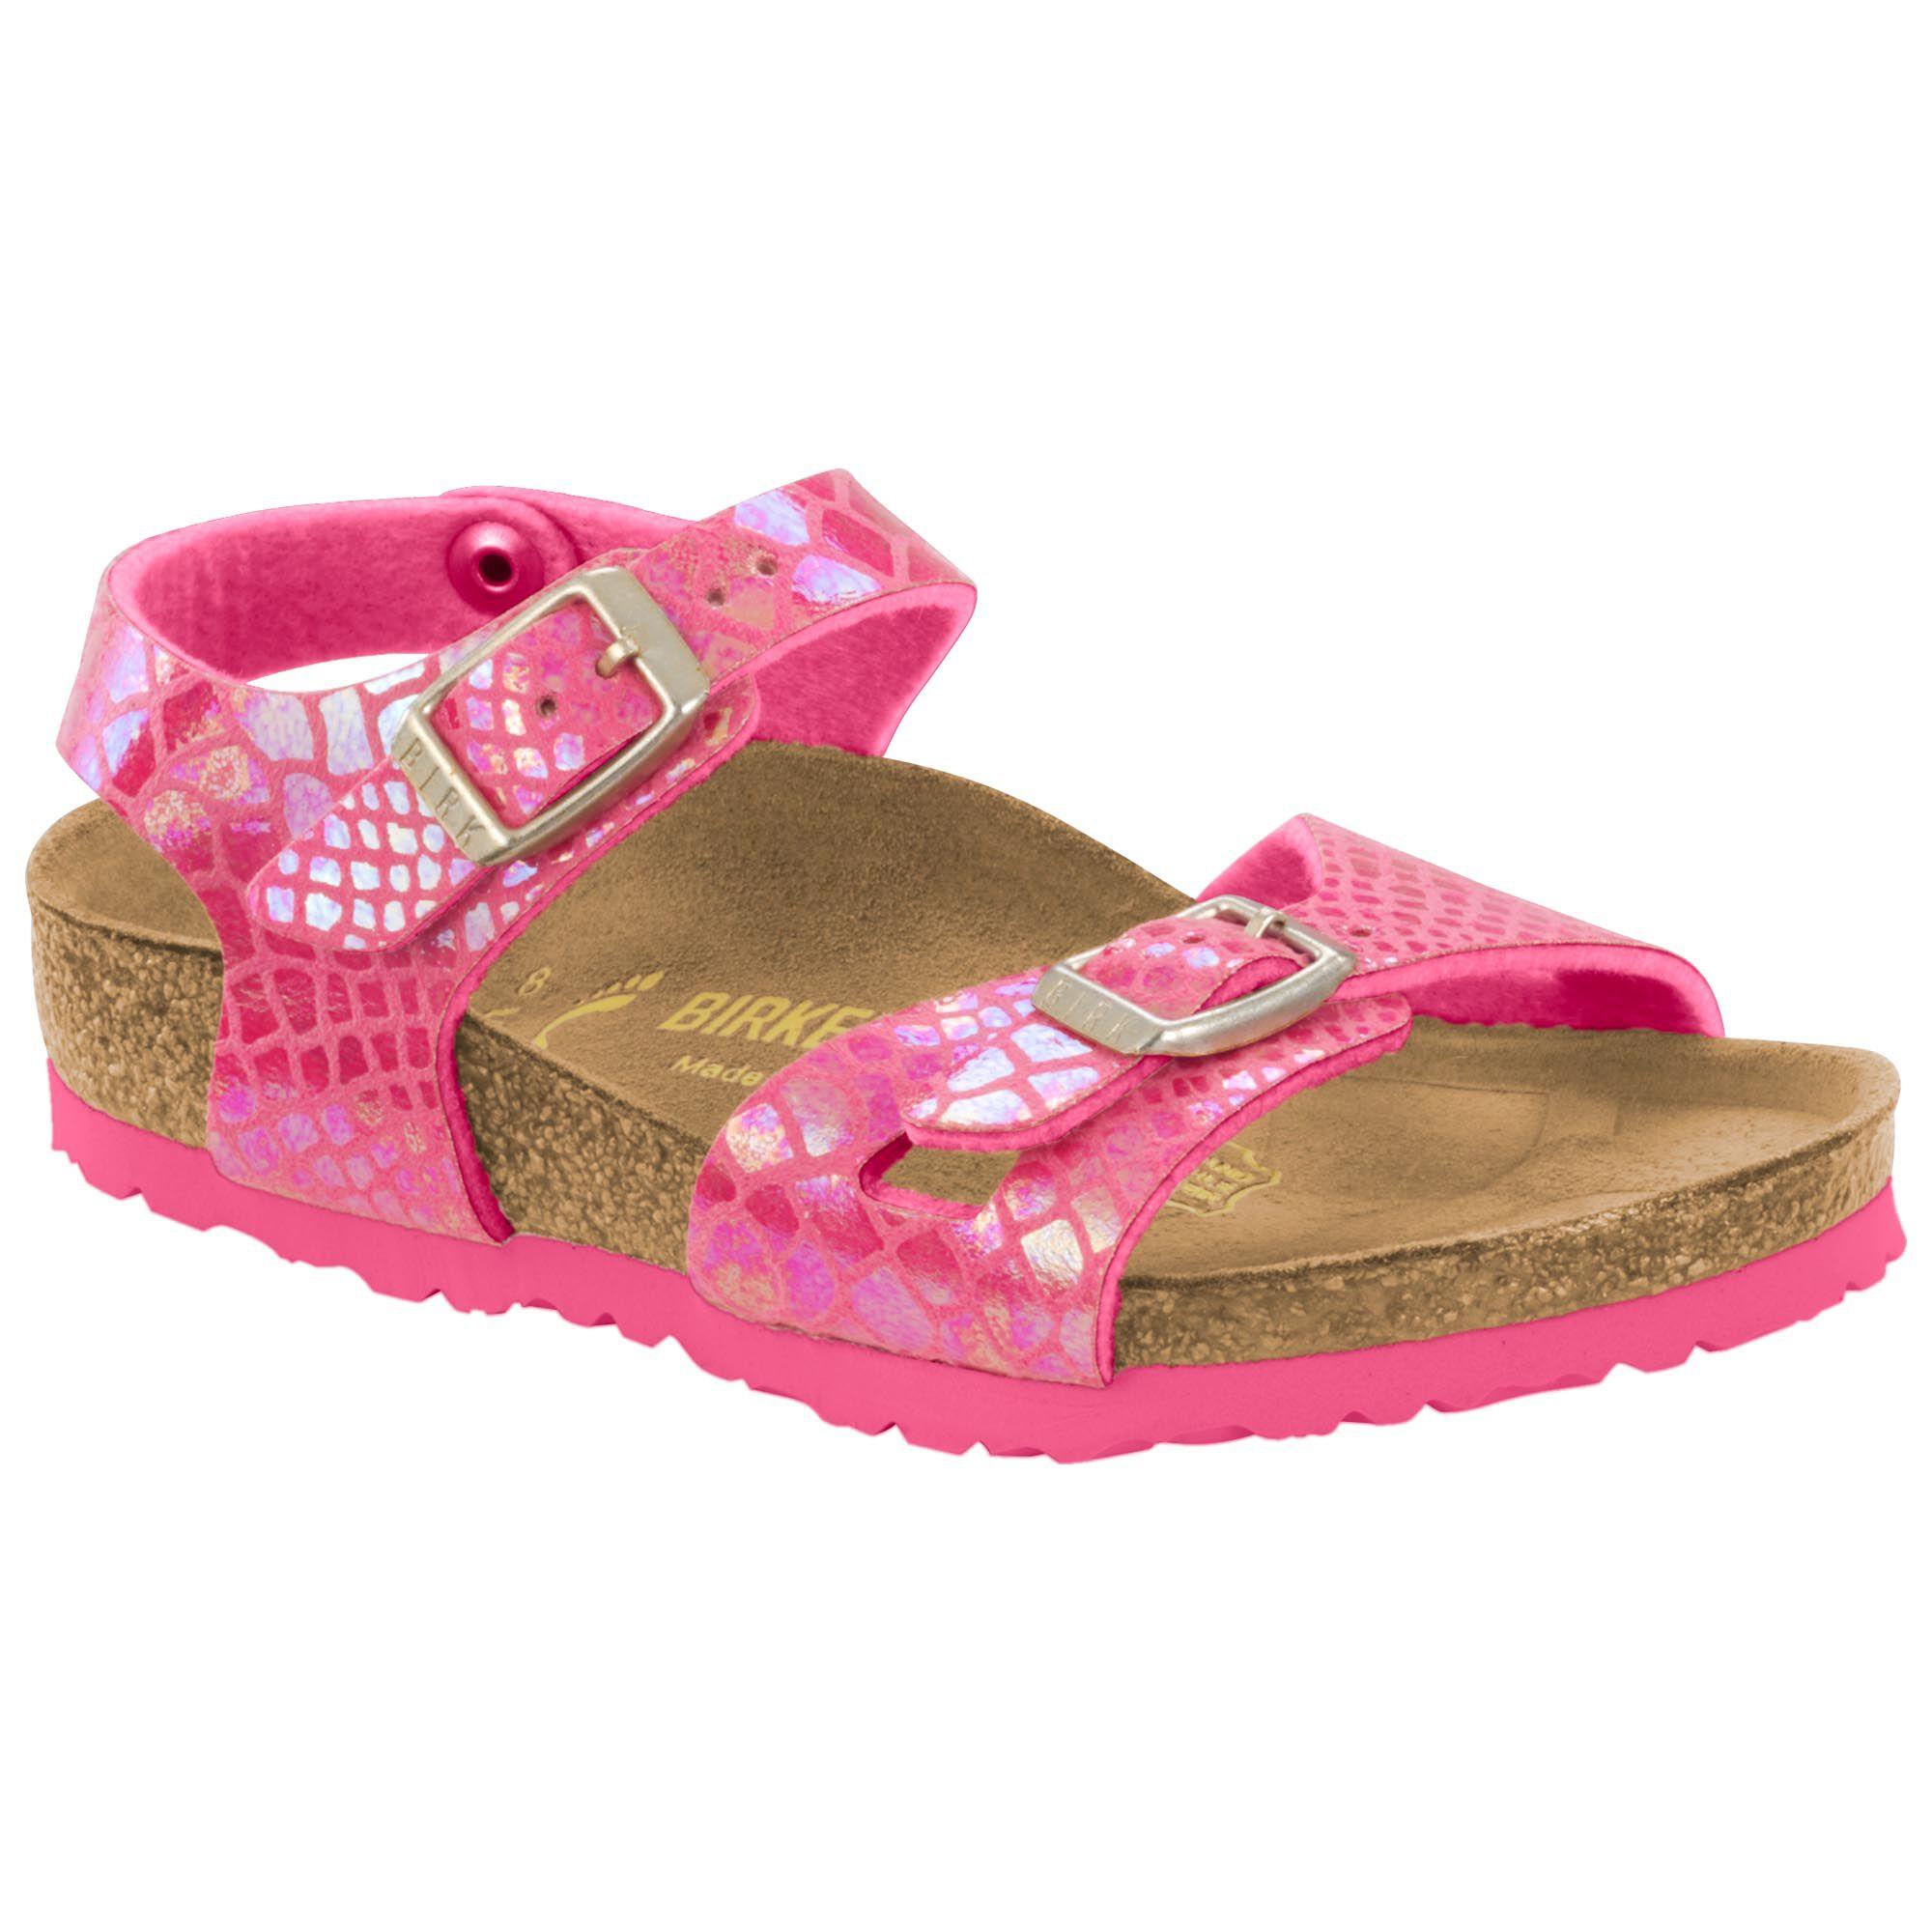 Birkenstock Rio Kids Shiny Snake Pink